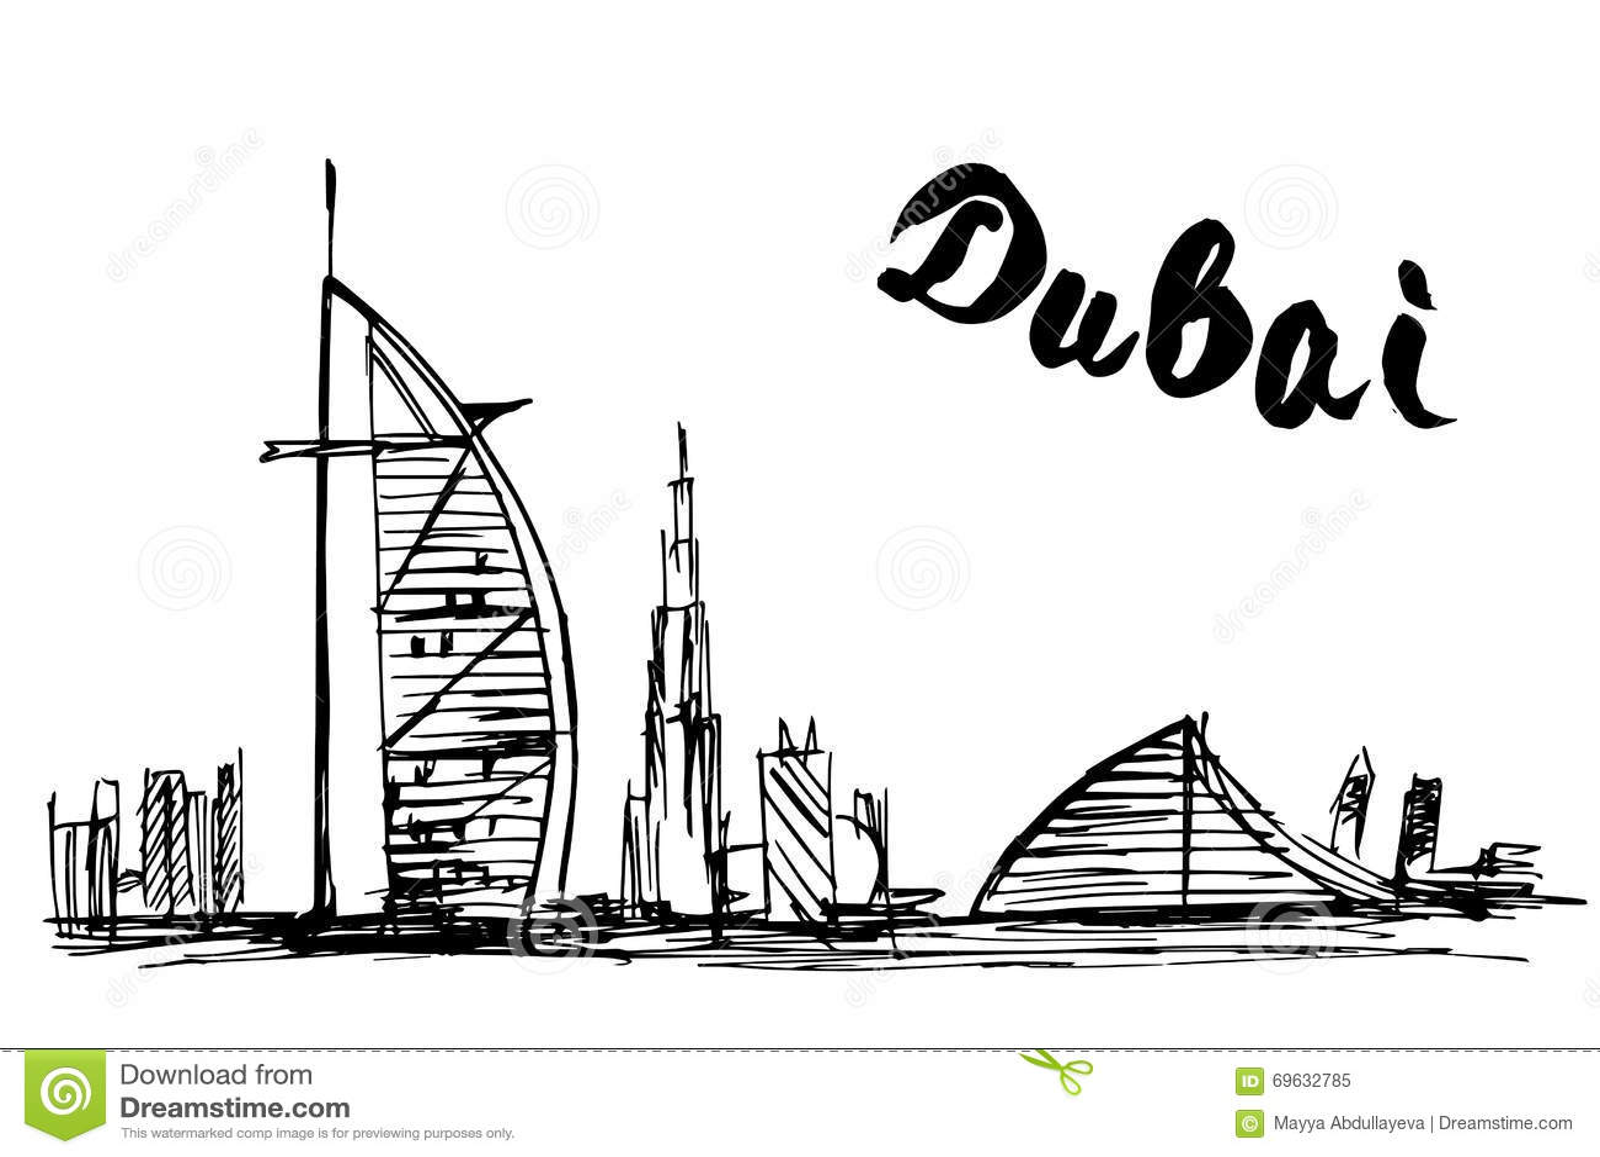 Дубай рисунок карандашом особенности покупки квартиры в дубае